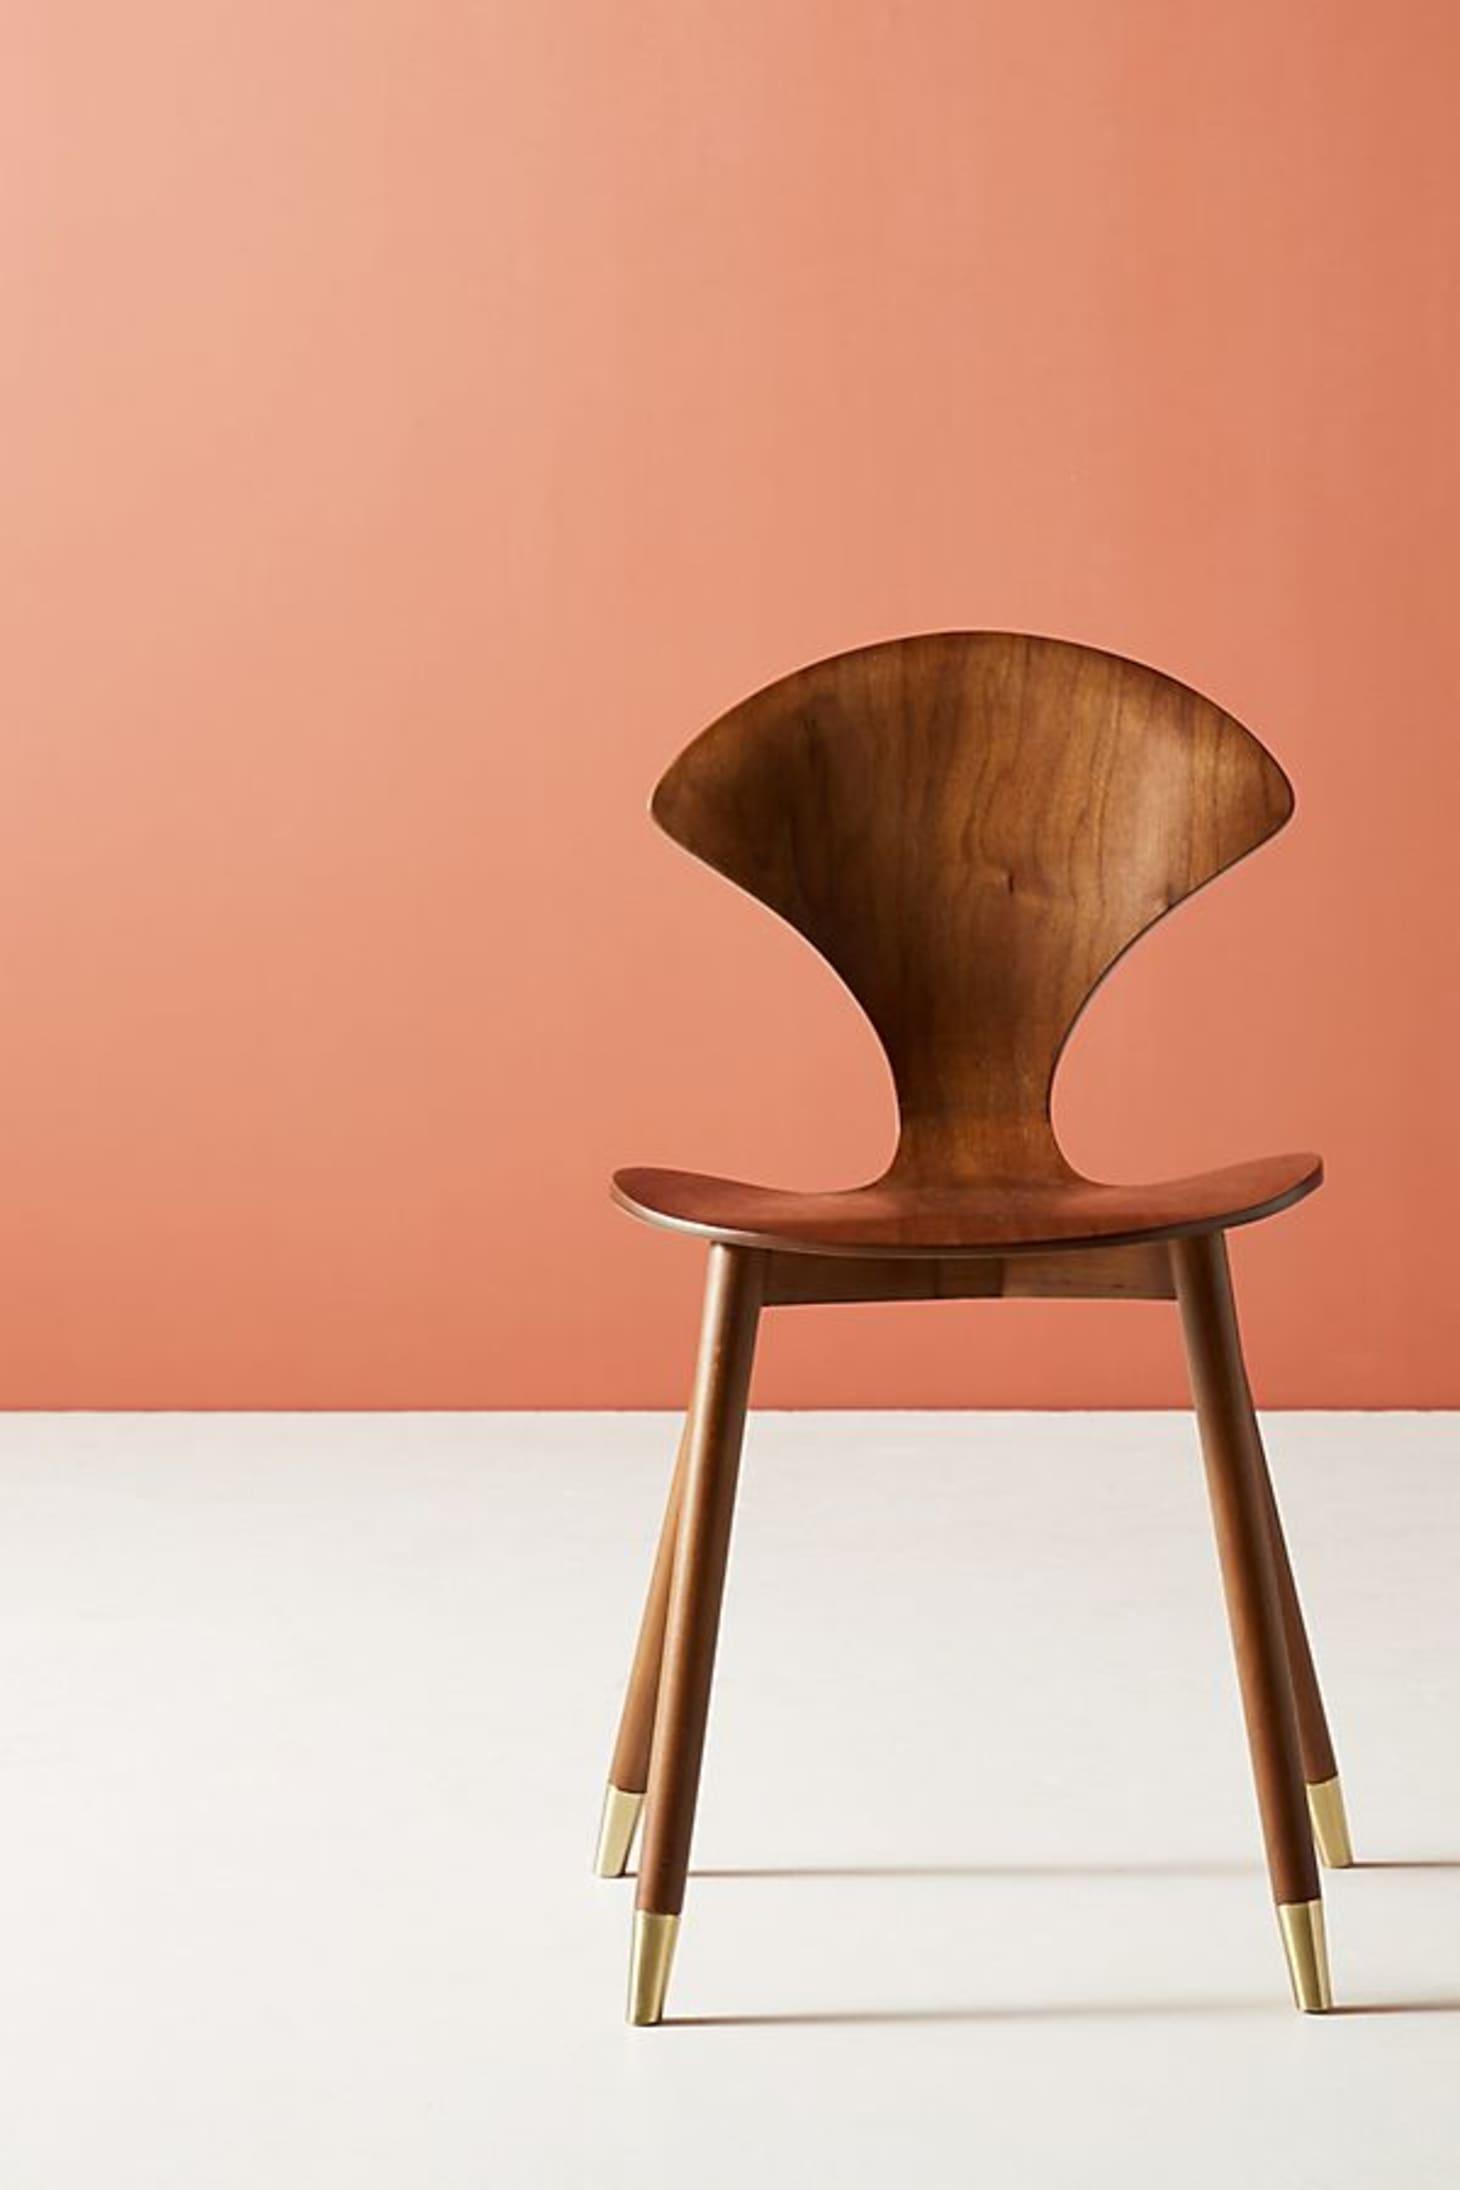 Anthropologie Furniture Decorating Sale May 2019 Kitchn